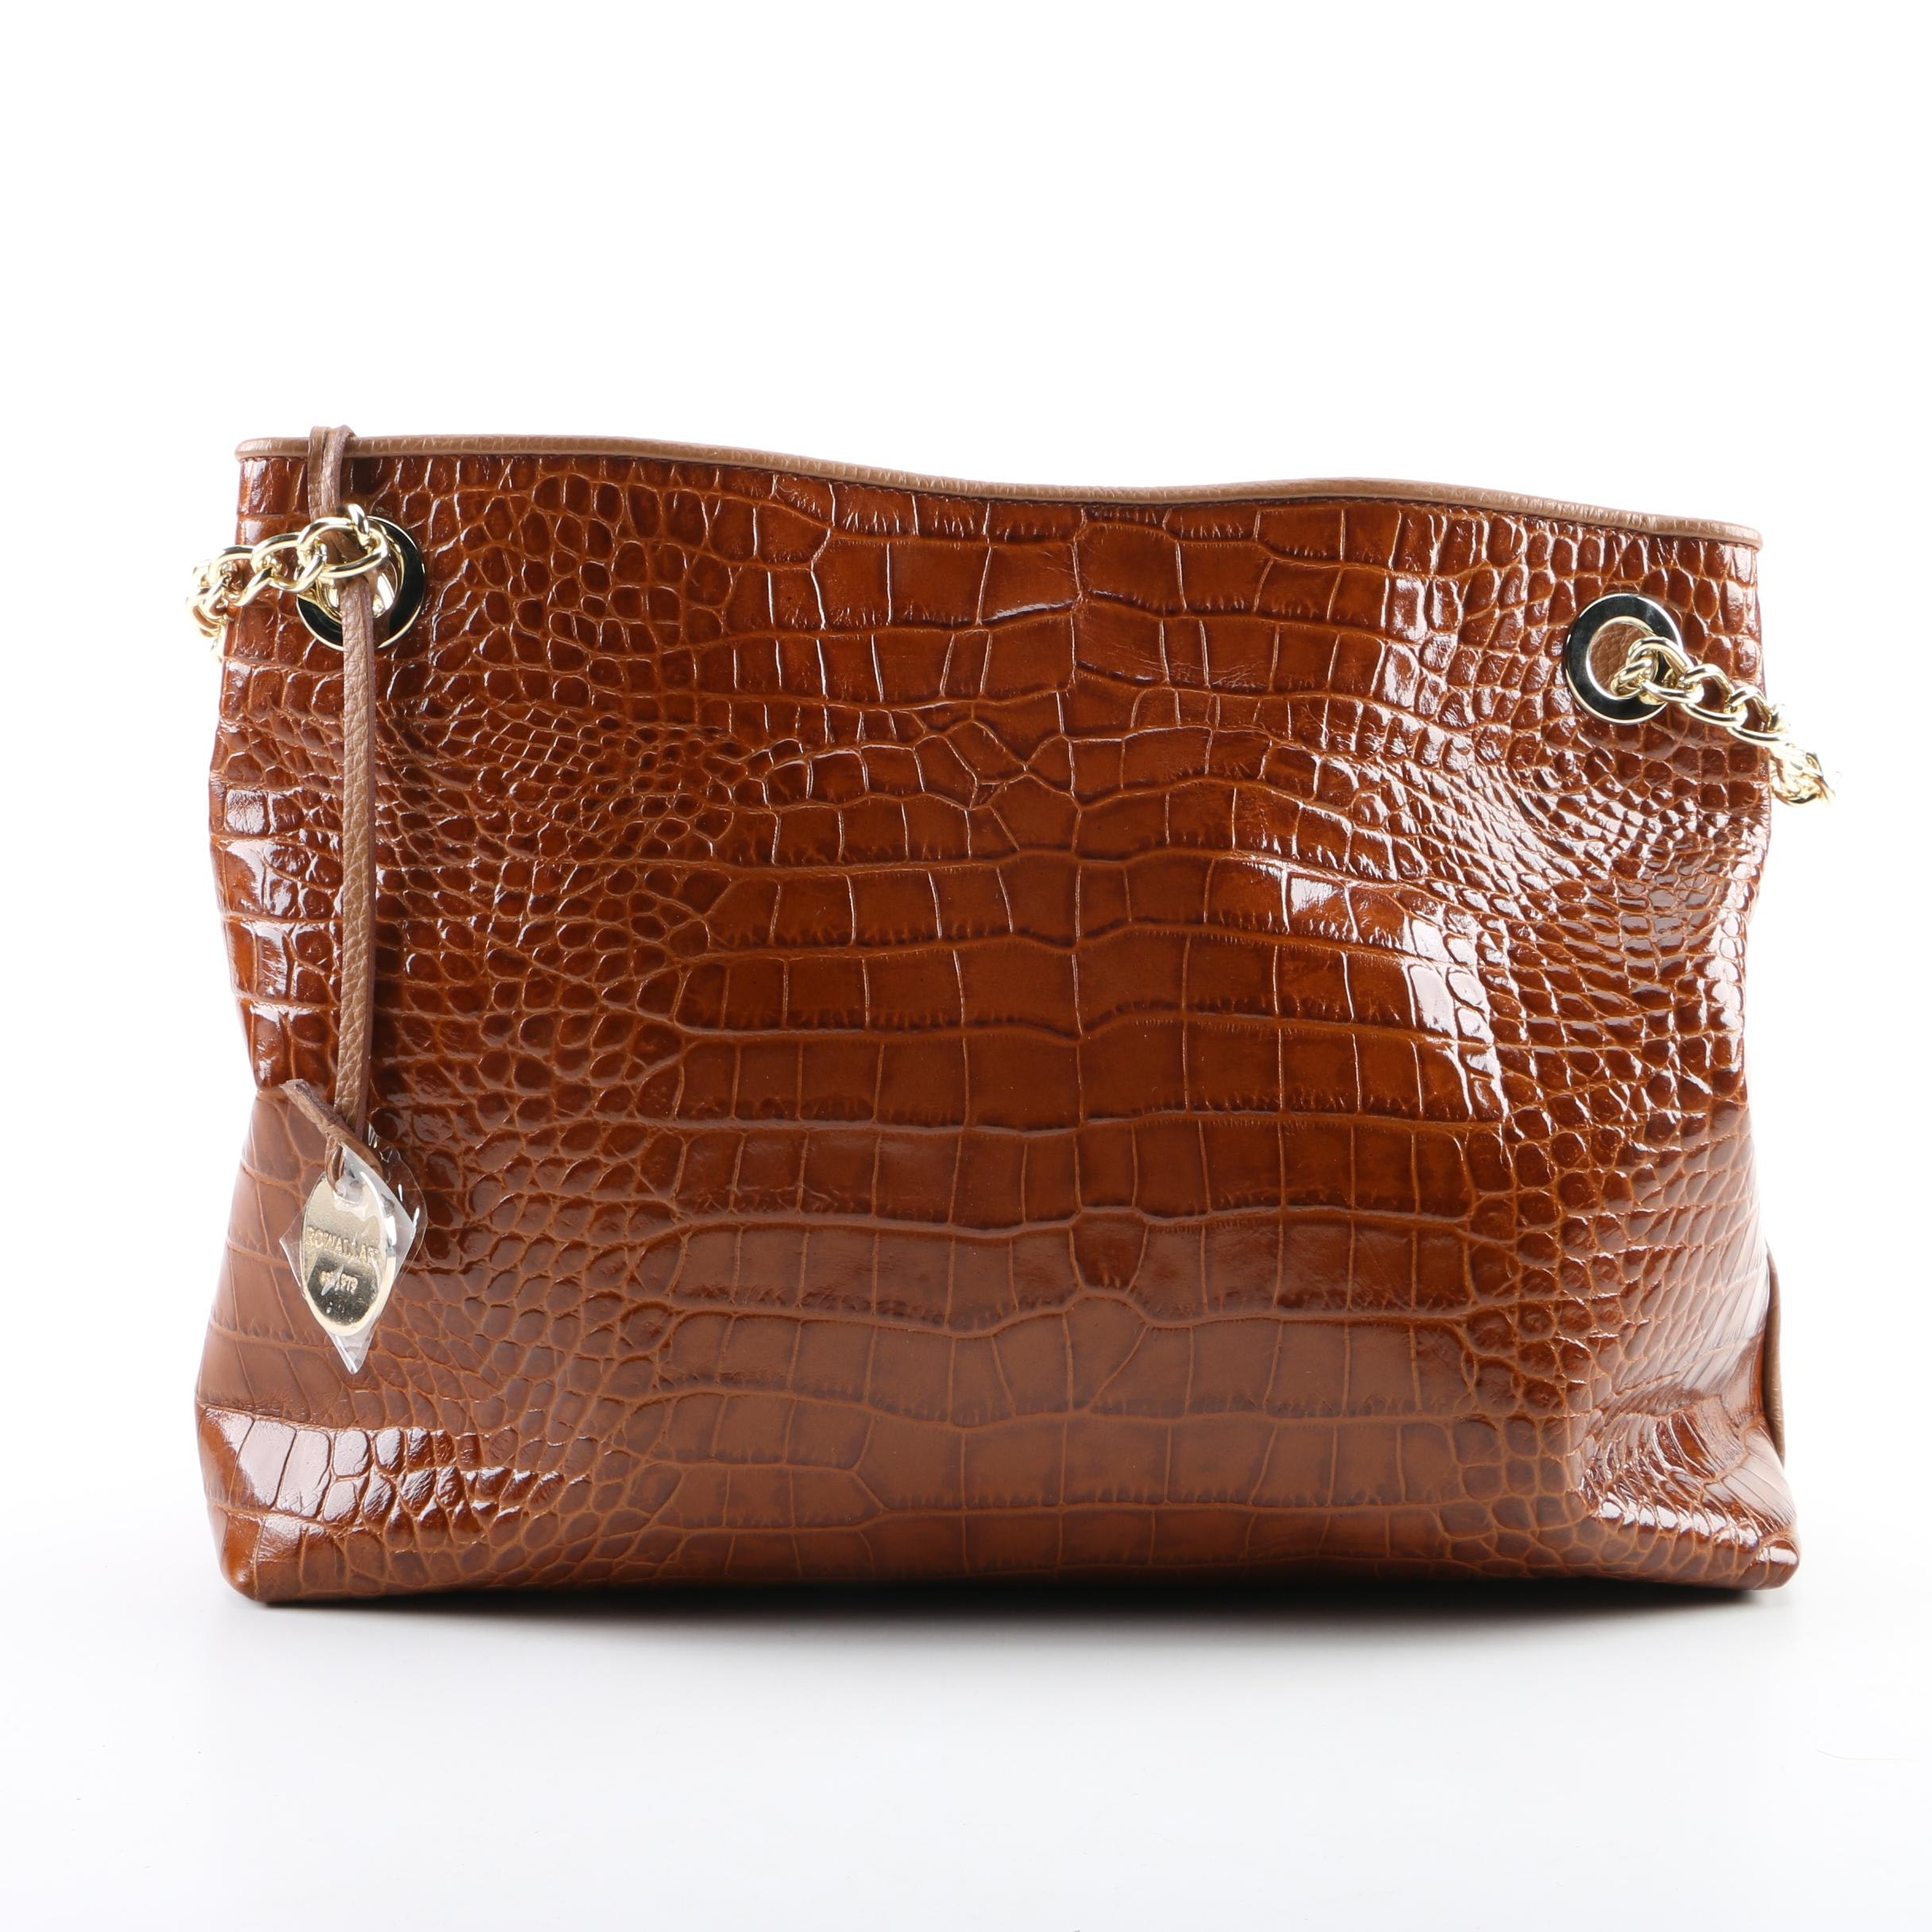 Rowallan Embossed Leather and Pebbled Leather Handbag in Brown